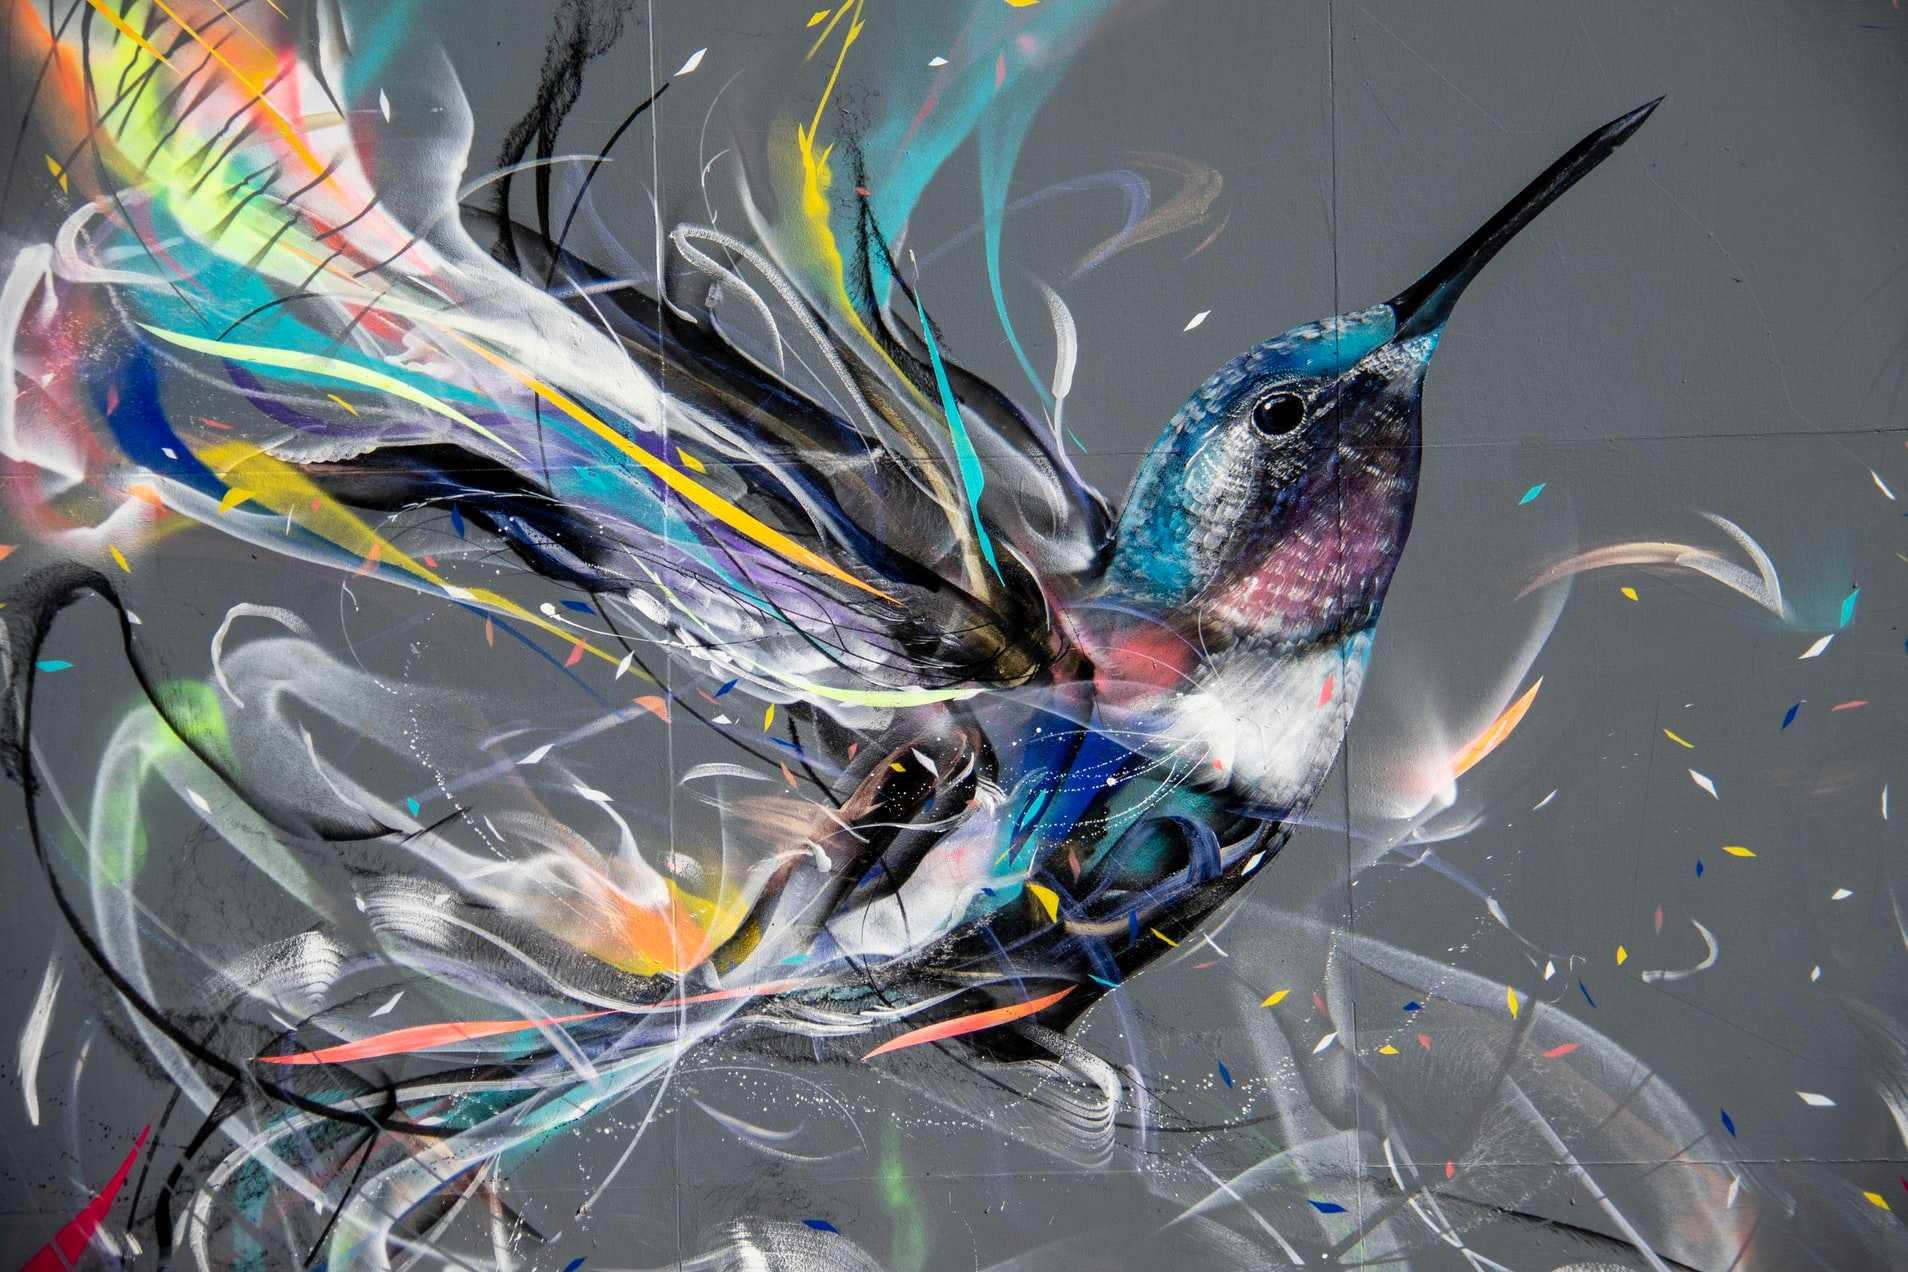 street art, Photo by Nick Fewings on Unsplash